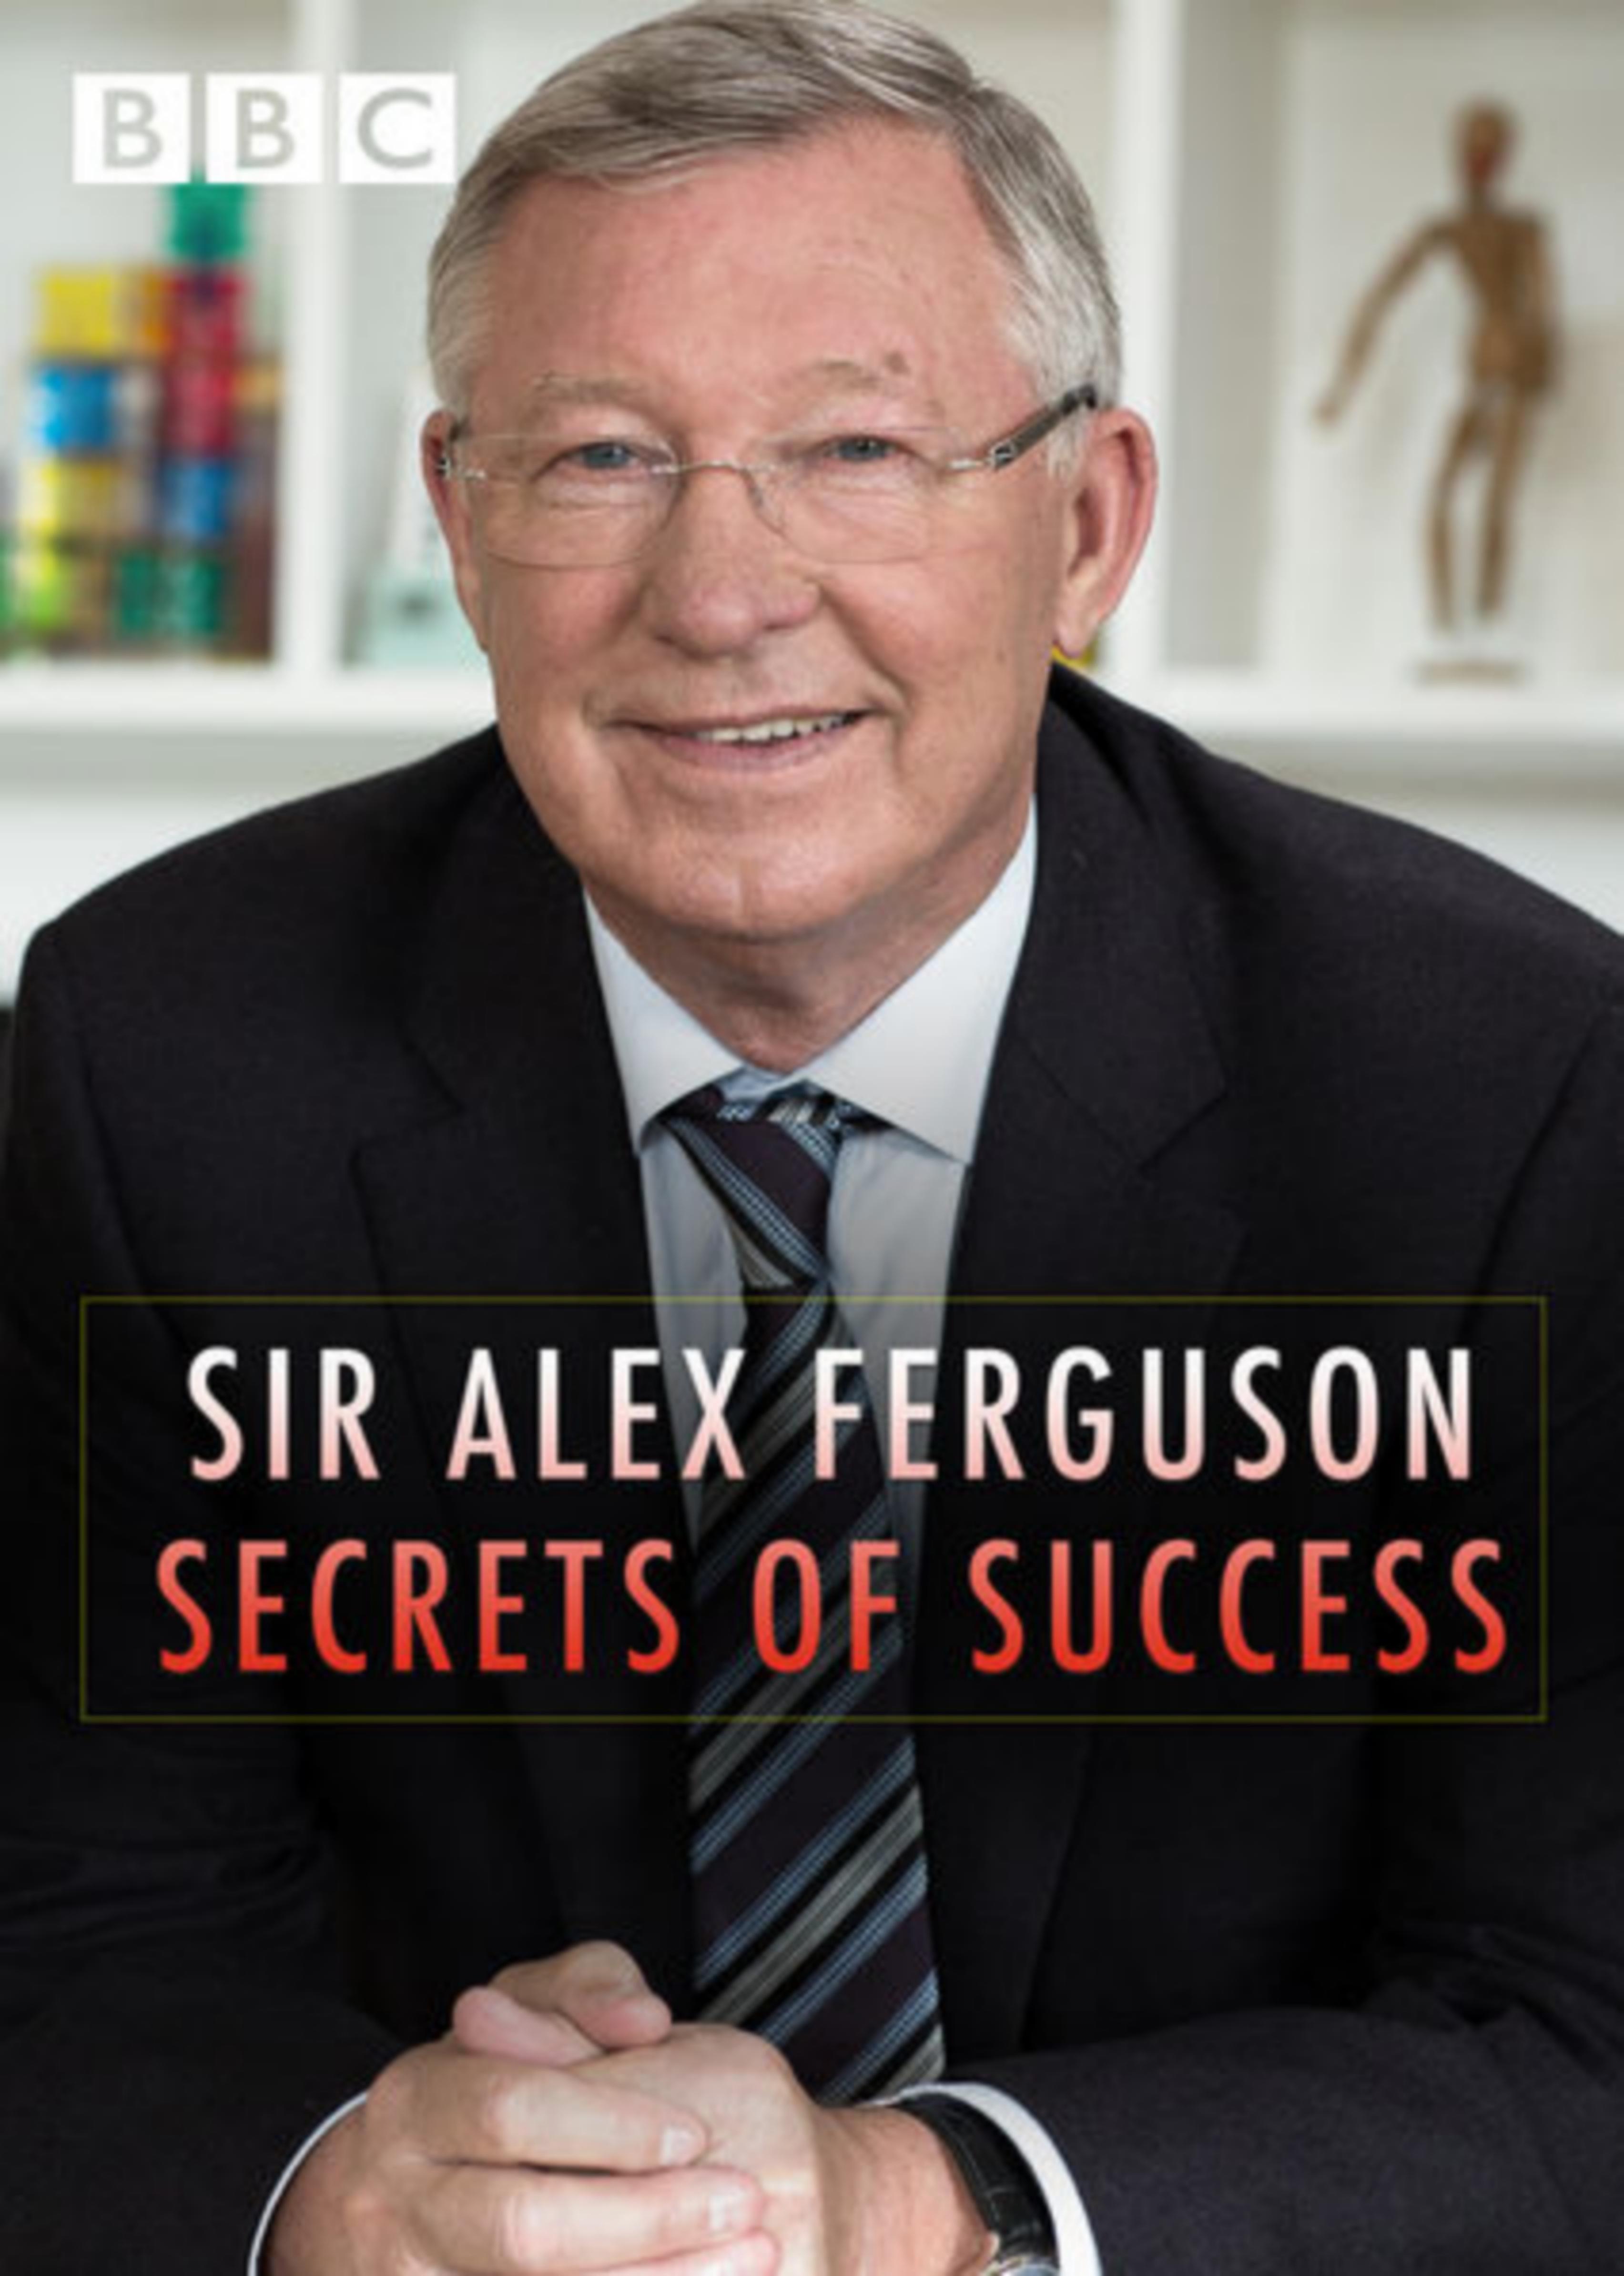 9ac4bdc5f8729 Sir Alex Ferguson: Secrets of Success (TV Movie 2015) - IMDb